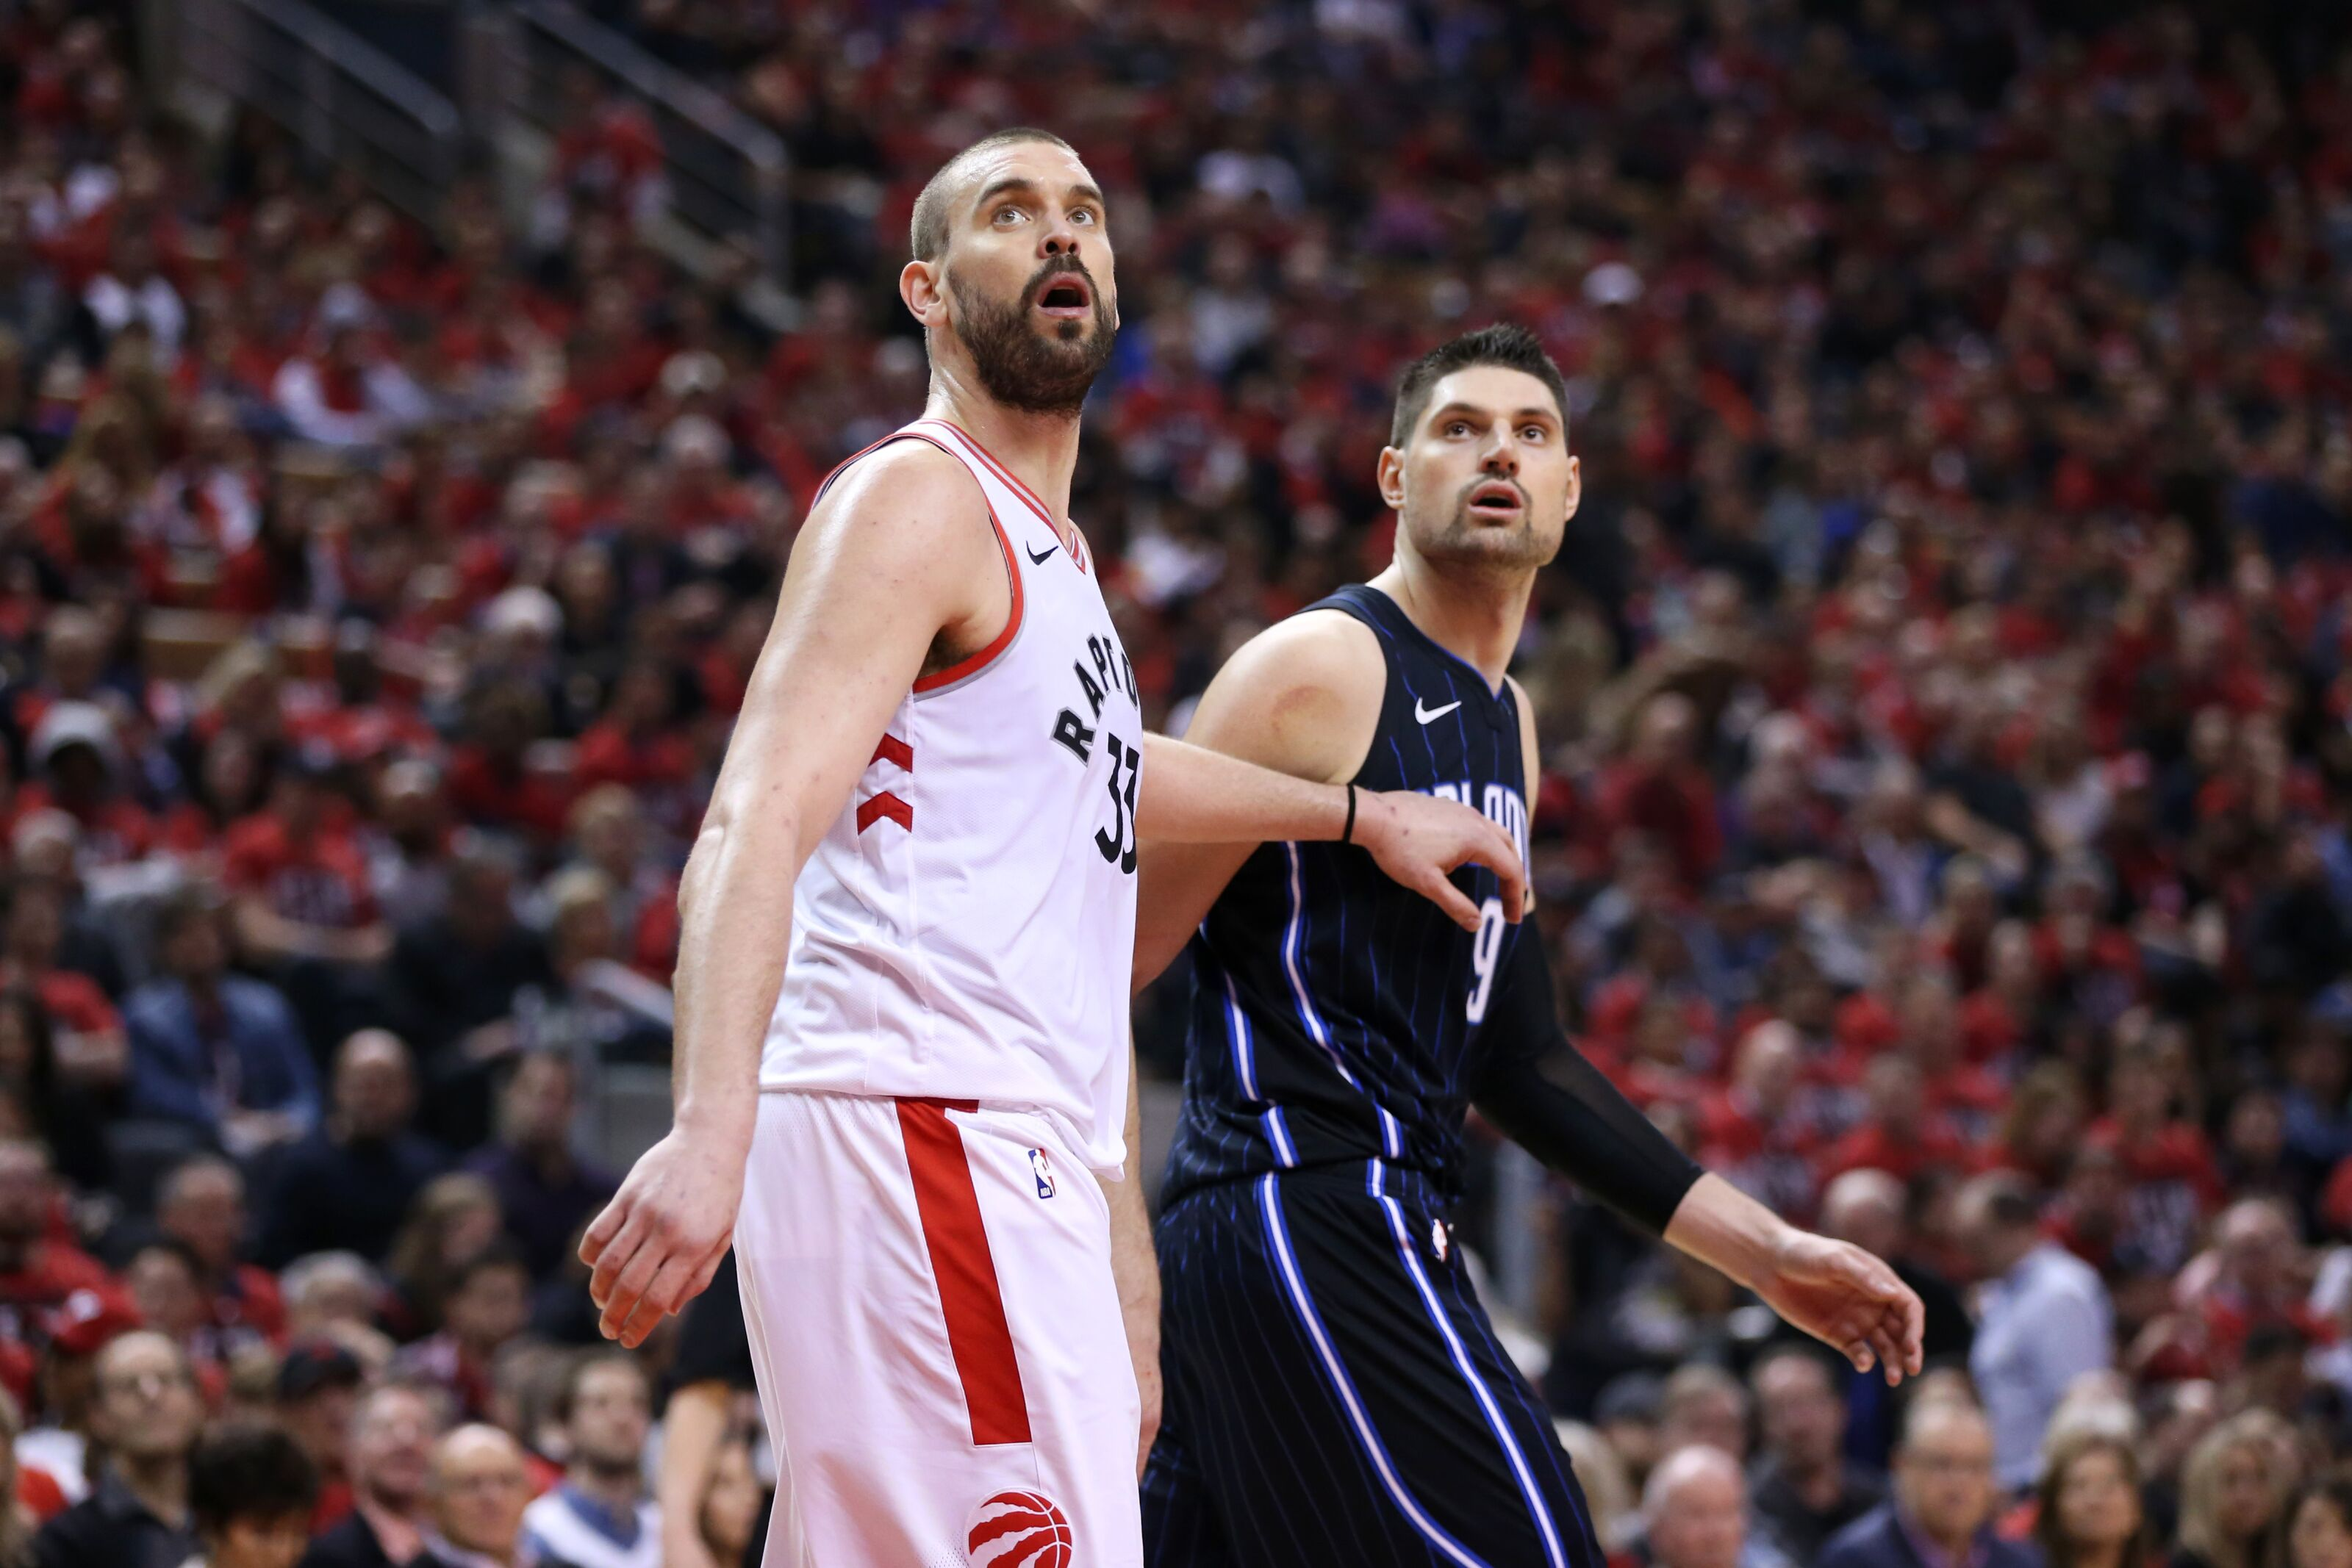 Toronto Raptors: Exposing Nikola Vucevic will result in continued success